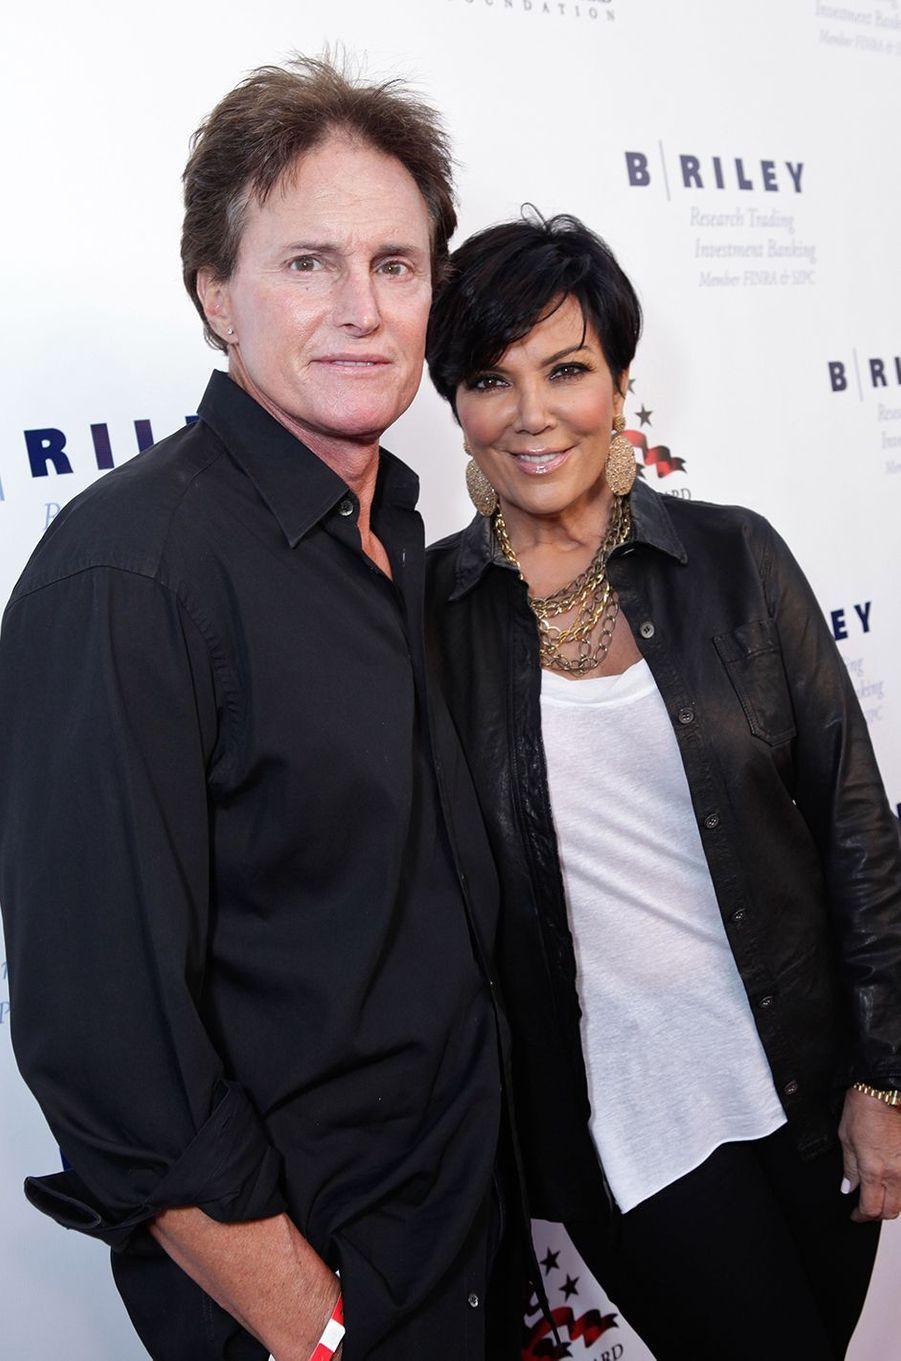 Bruce et Kris Jenner à un gala caritatif à Santa Monica en mai 2011